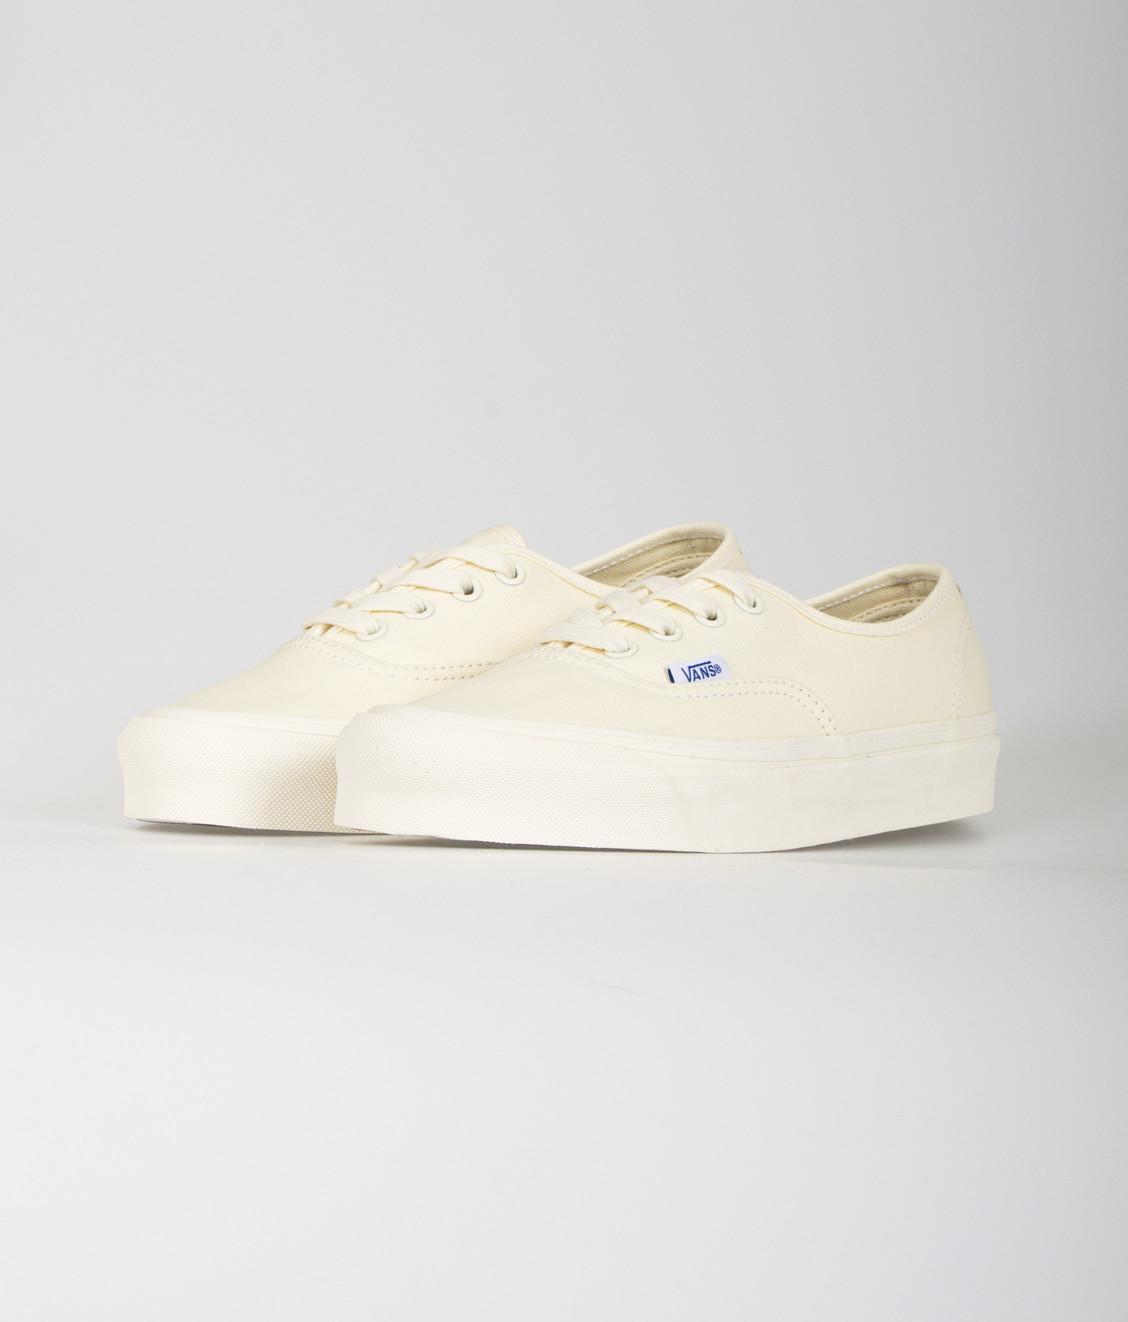 Vans Vans Vault OG Authentic LX White